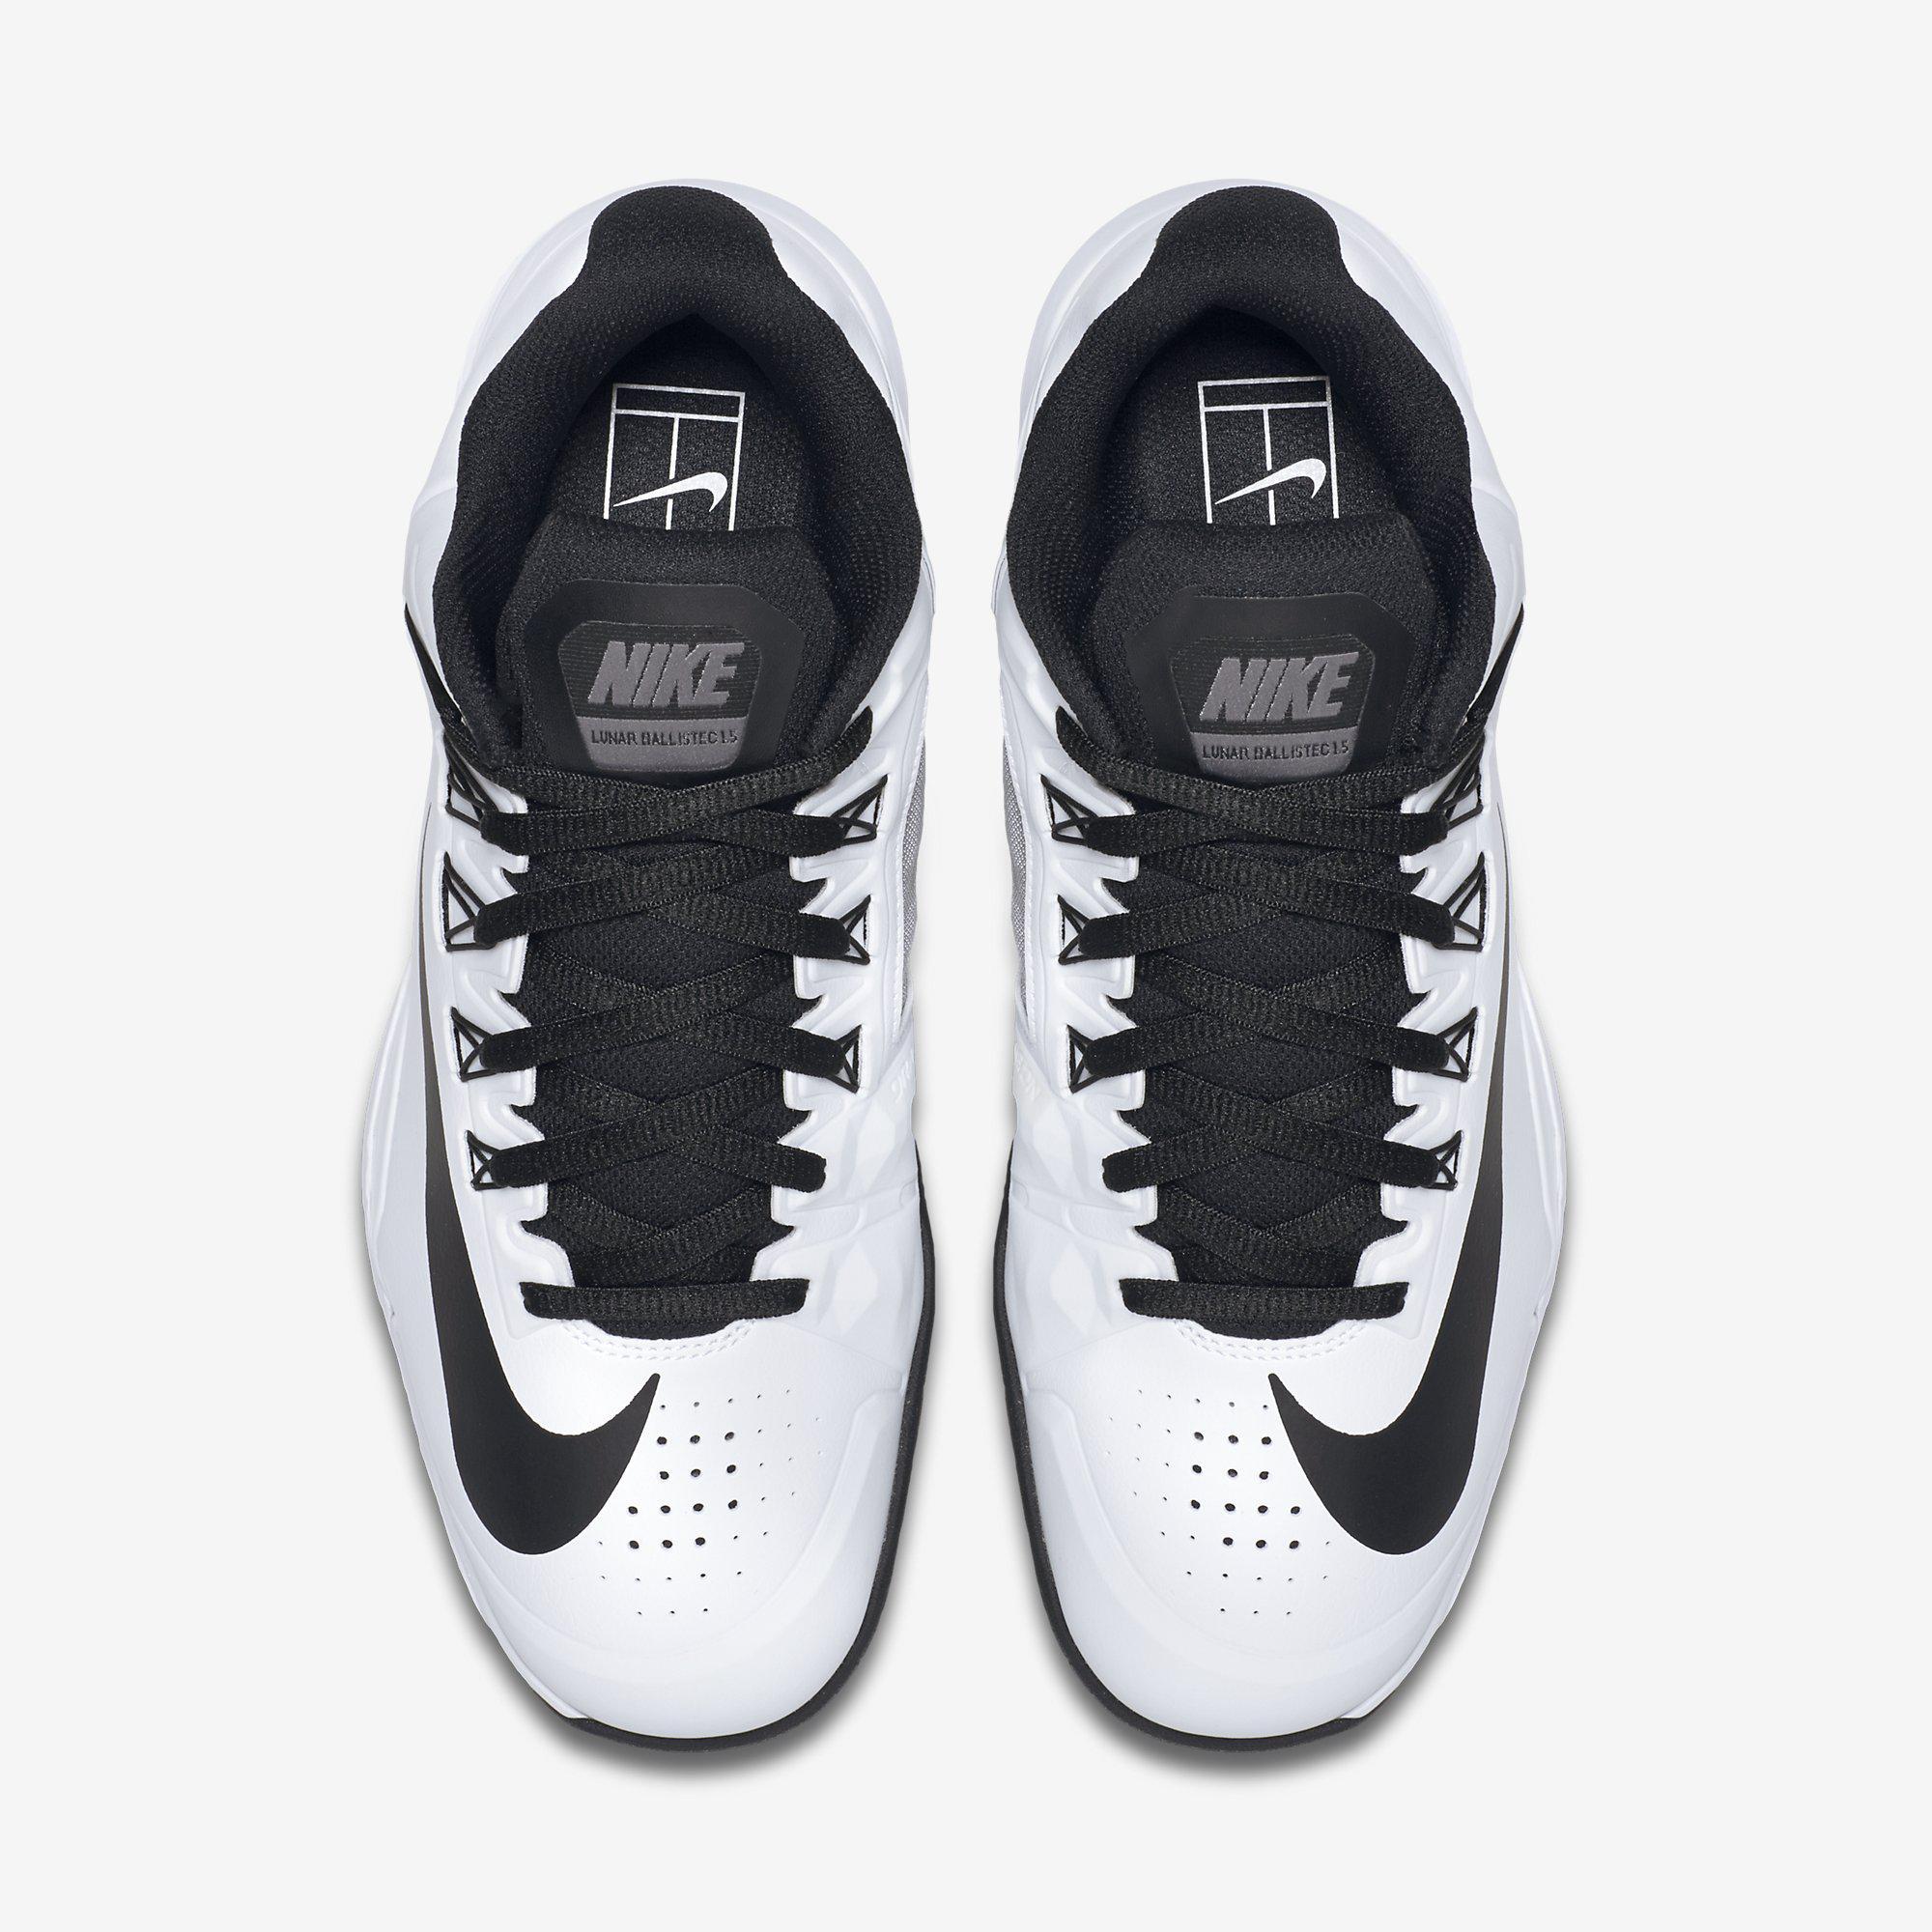 new style b7da2 61963 france nike mens lunar ballistec 1.5 tennis shoes white black 3e7f9 fc070